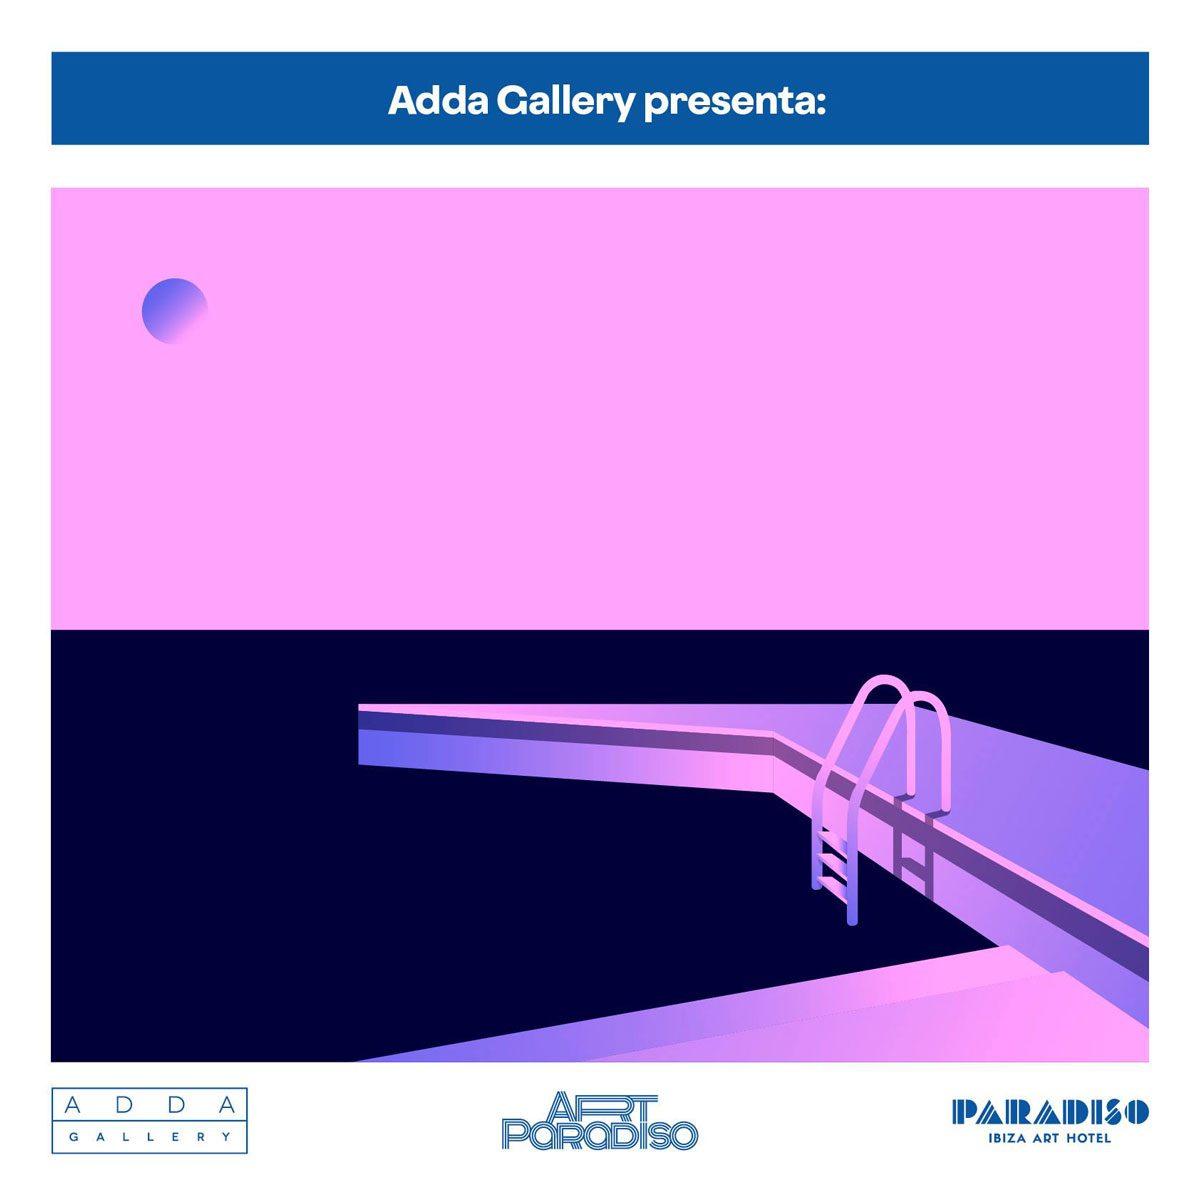 выставка-Pebe-Paradiso-ibiza-art-hotel-2020-welcometoibiza